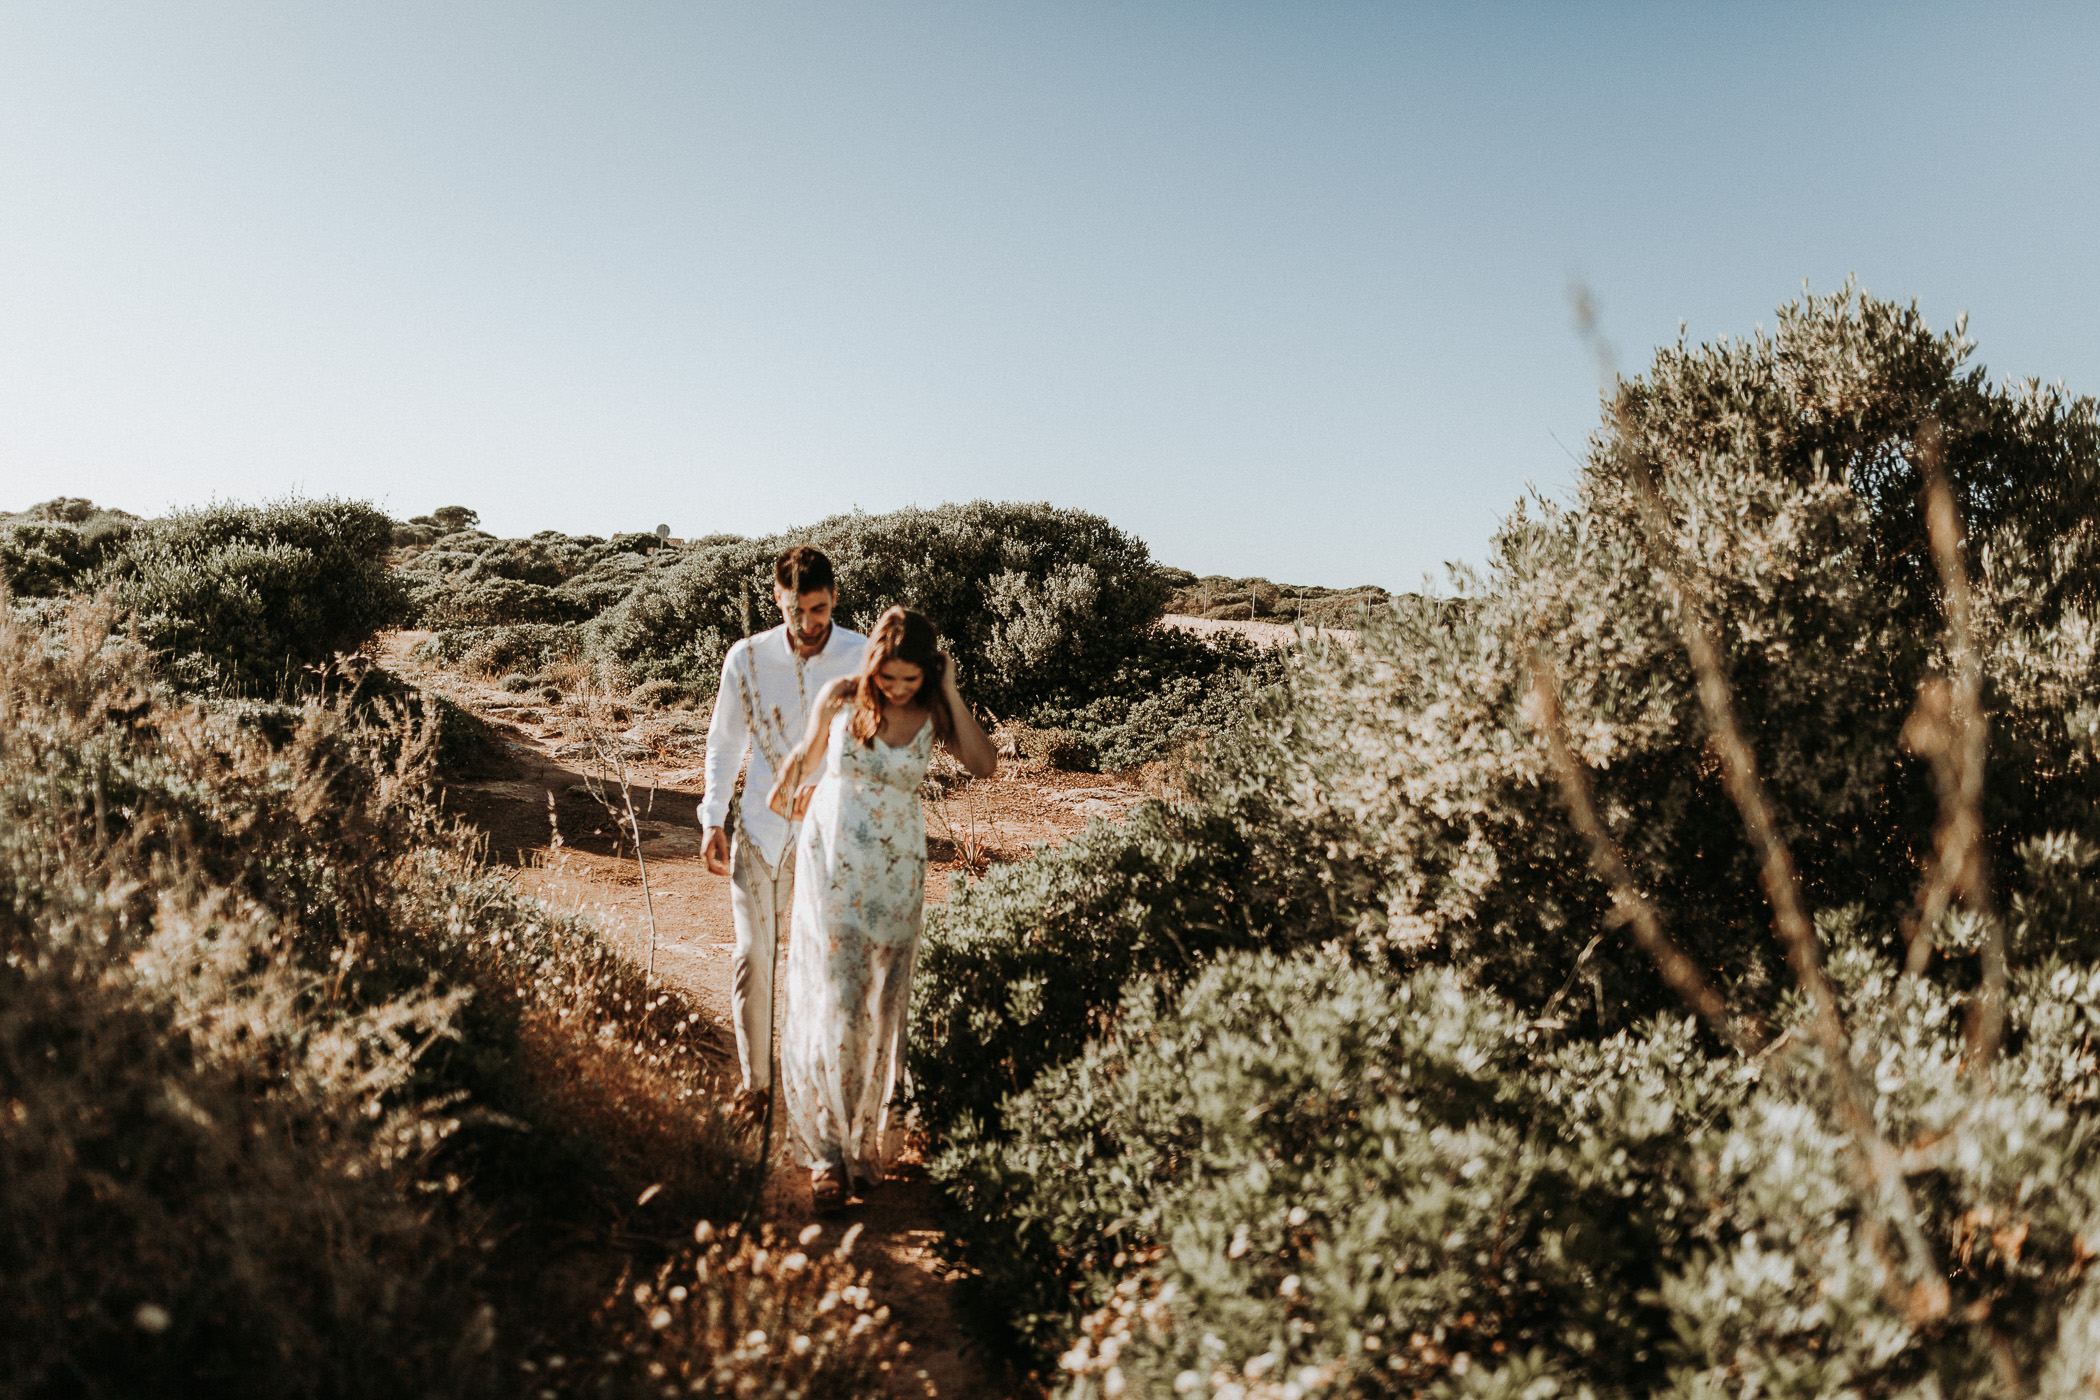 DanielaMarquardtPhotography_wedding_elopement_mallorca_spain_calapi_palma_lauraandtoni_211